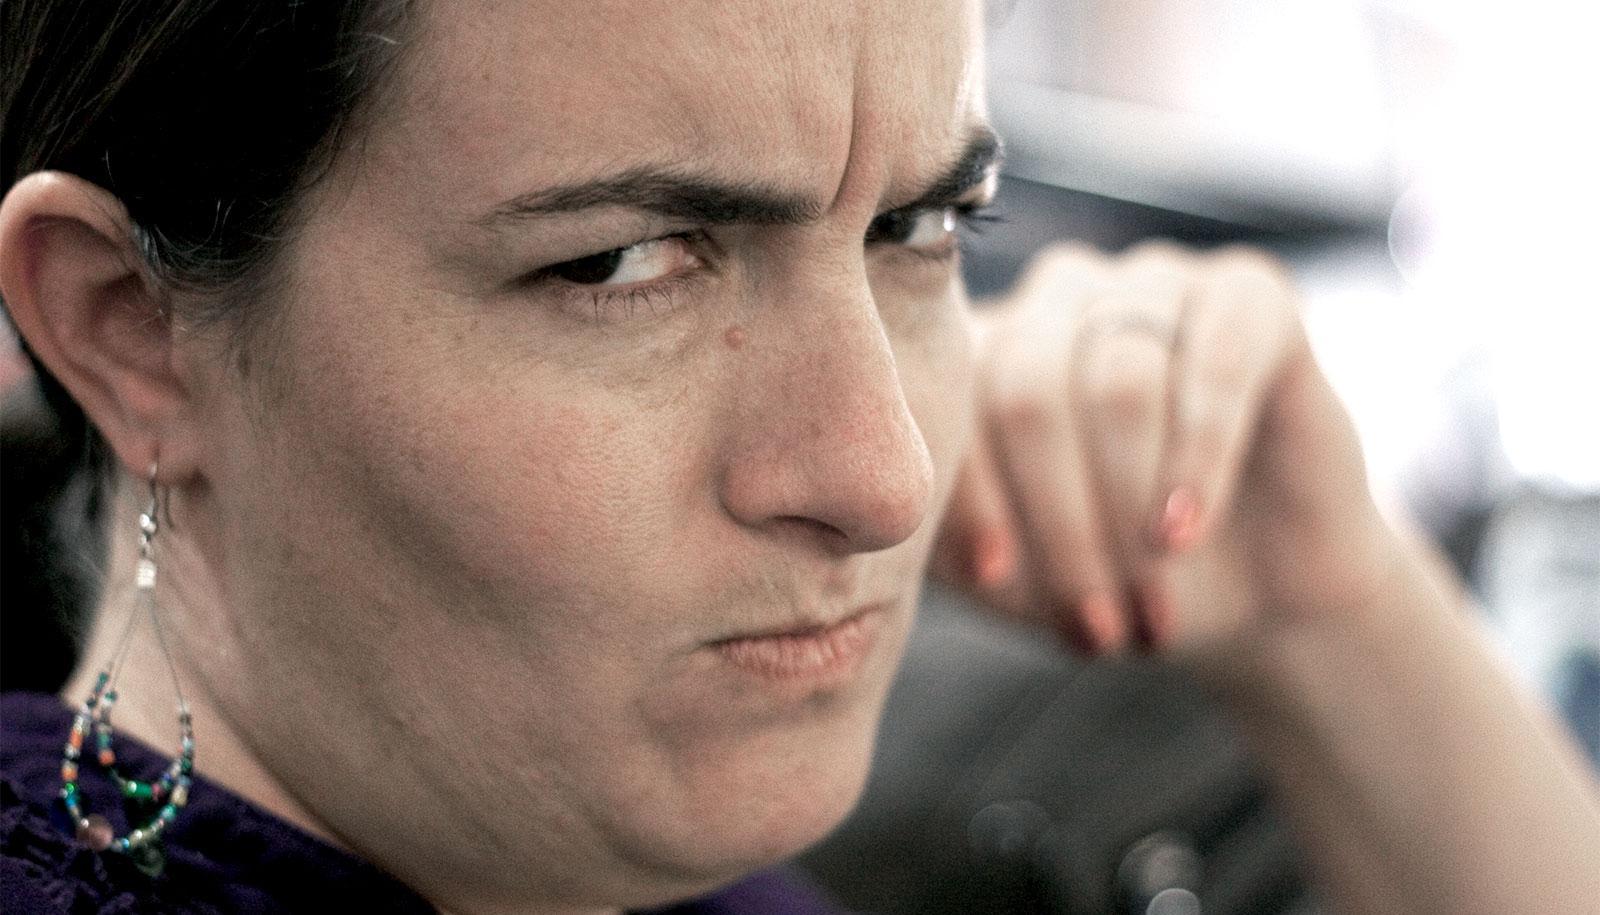 fake angry face